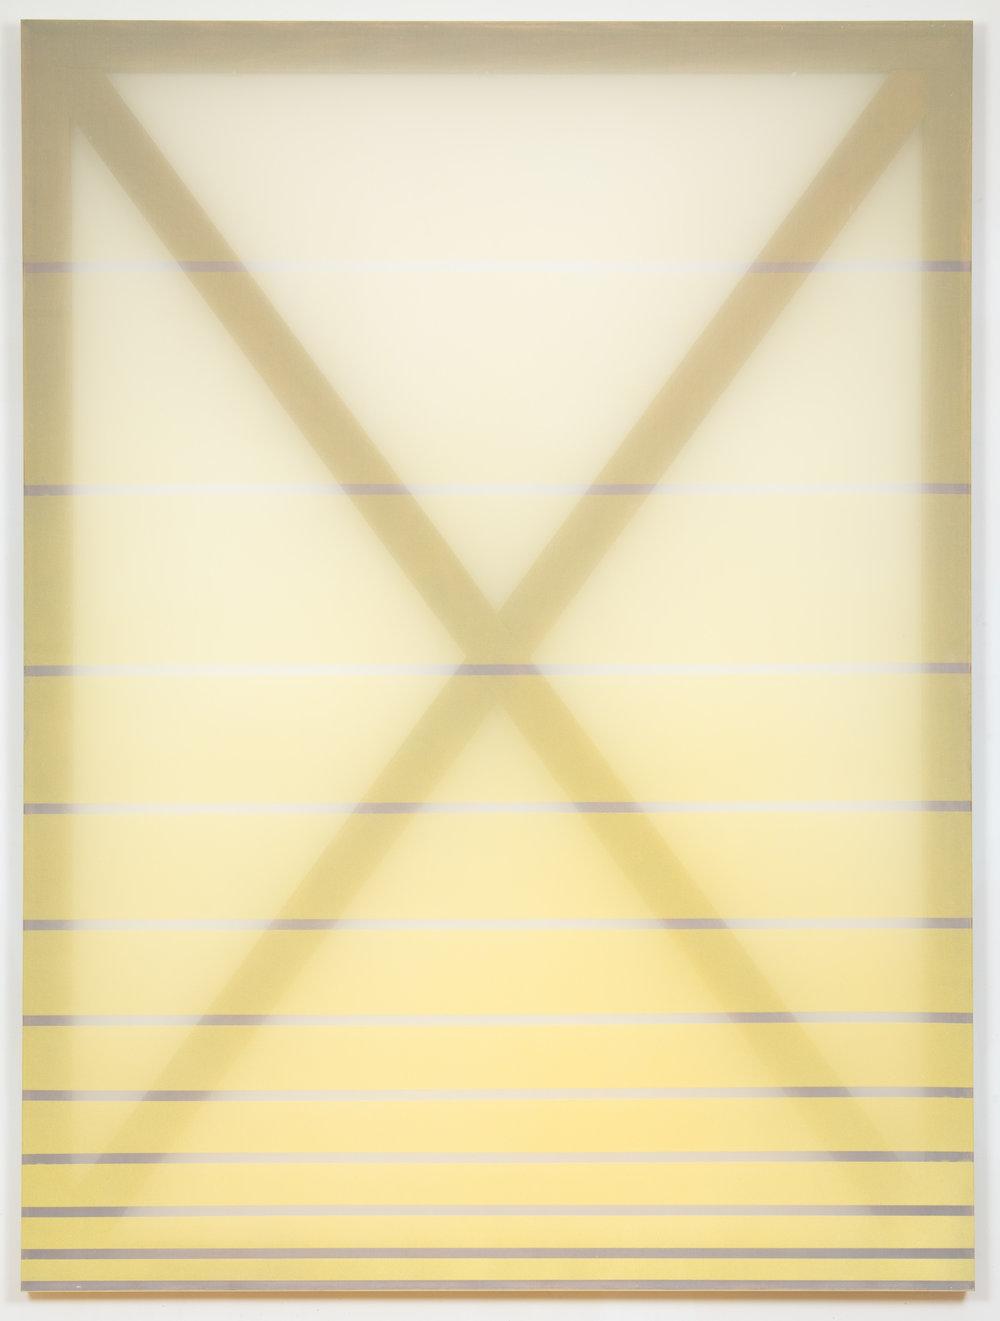 X (yellow) 2015 oil and acrylic on silk 60 in x 45 in